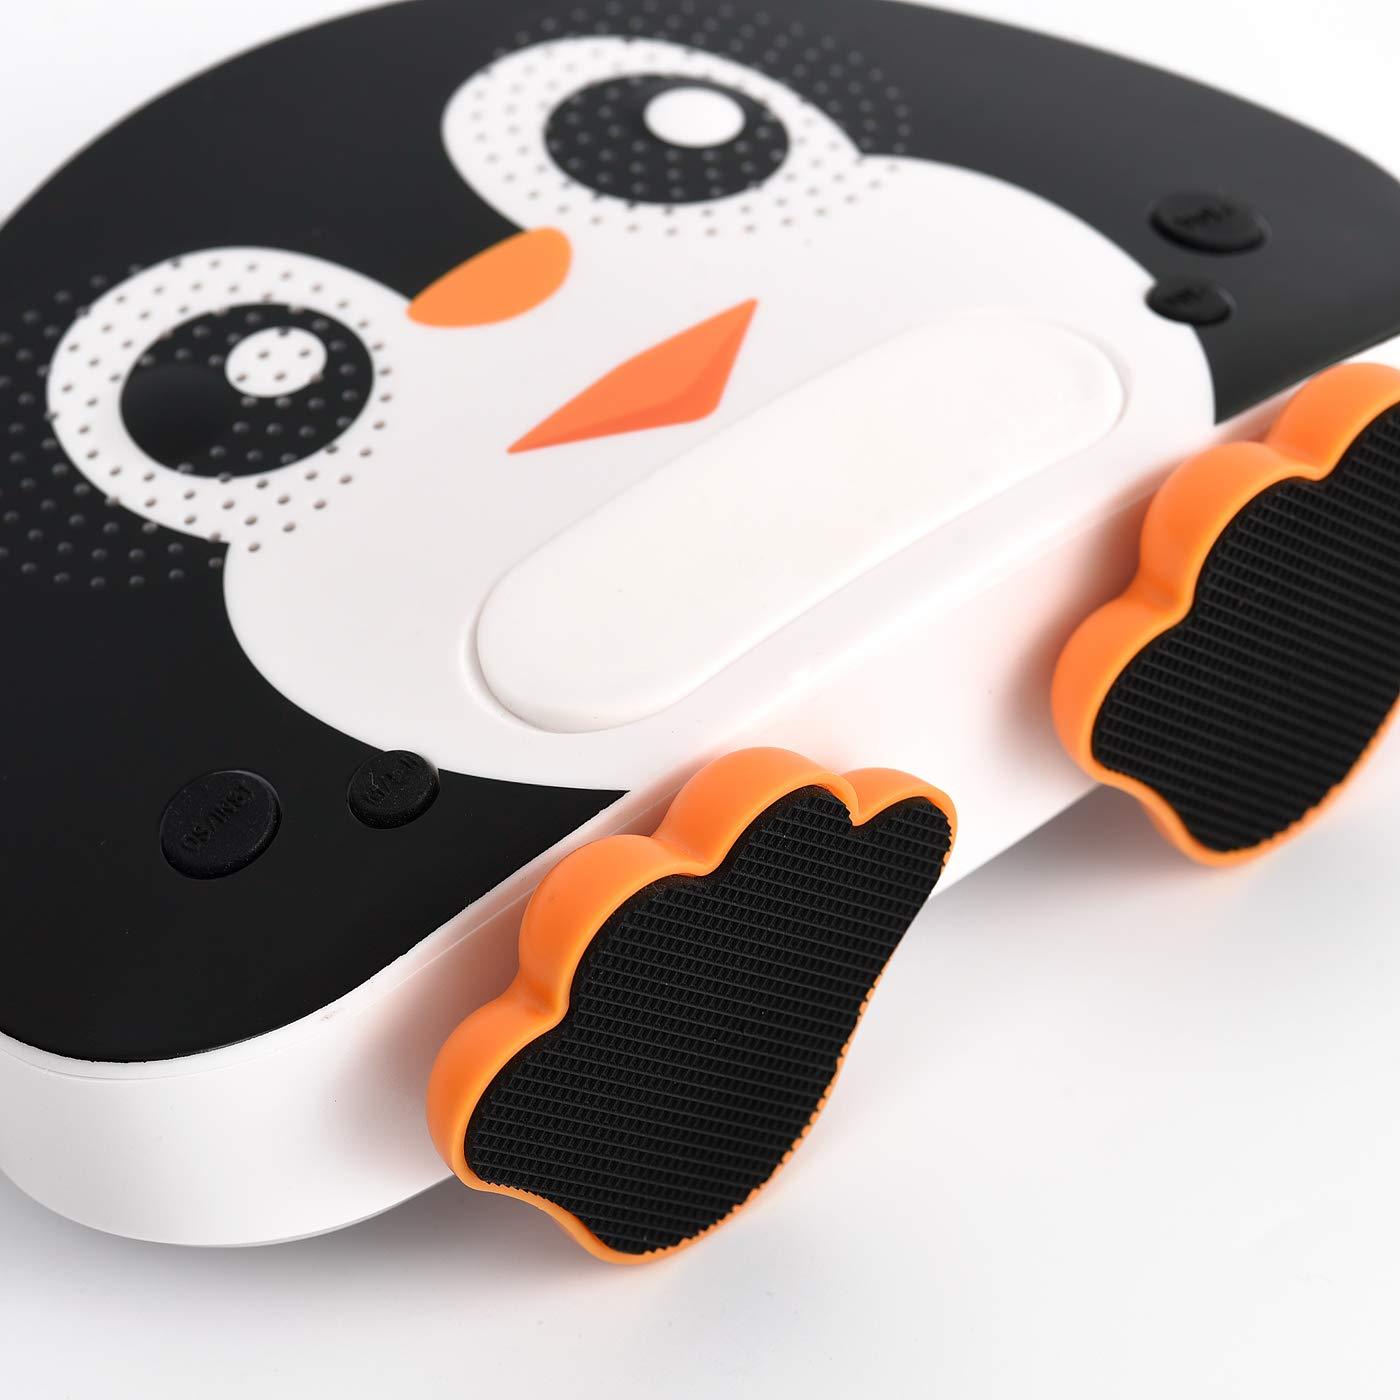 HowQ Outdoor Toys Karaoke Machine , Portable Kids Karaoke Bluetooth Speaker Wireless Cartoon Speaker for Kids for Indoor Toys Travel Activities with Microphone Penguin Karaoke Machine(Black-White) by HowQ (Image #5)